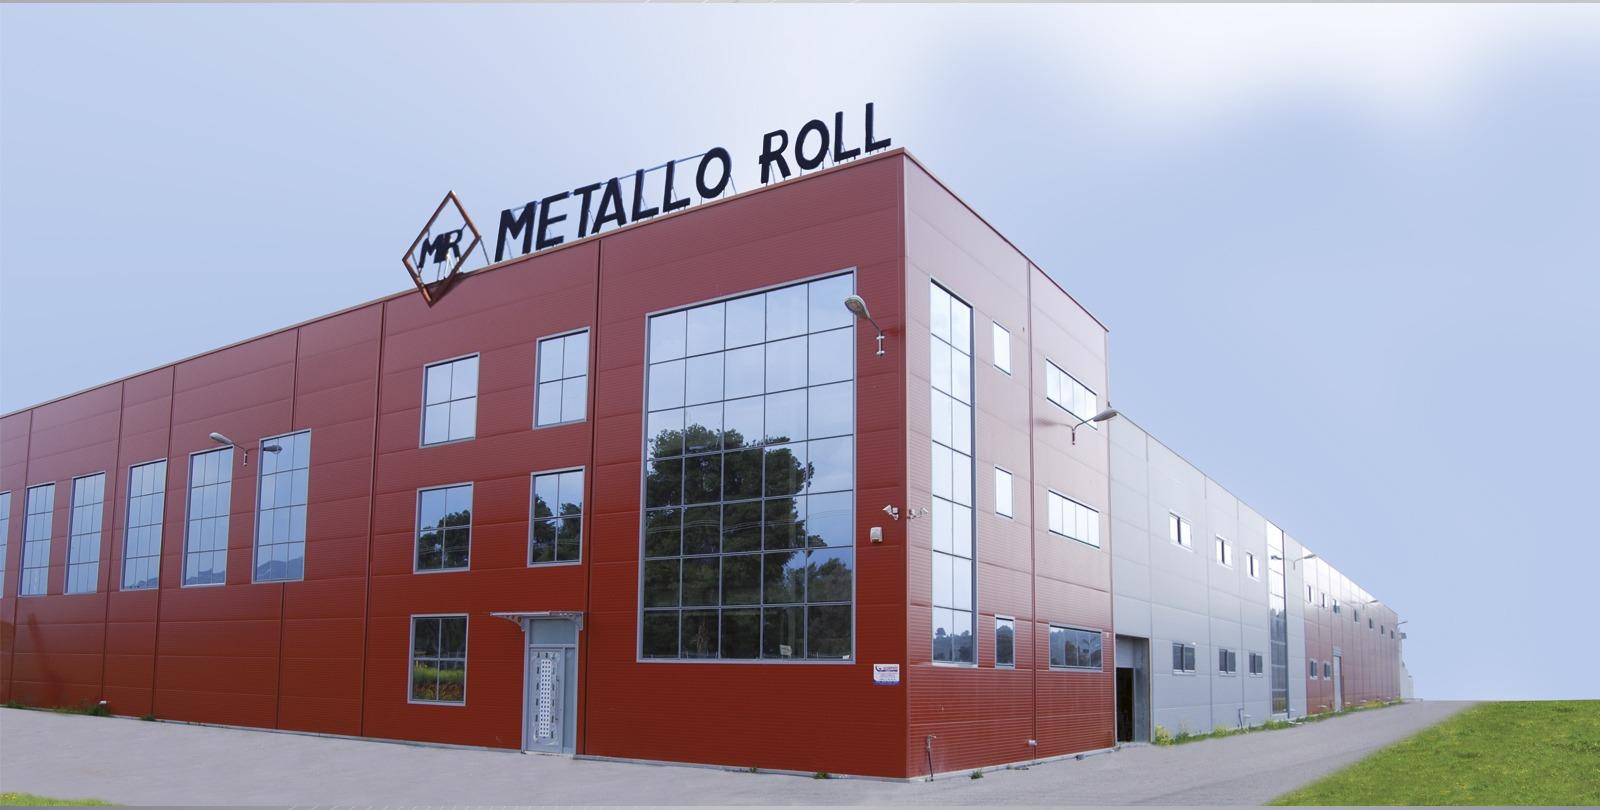 METALLO ROLL